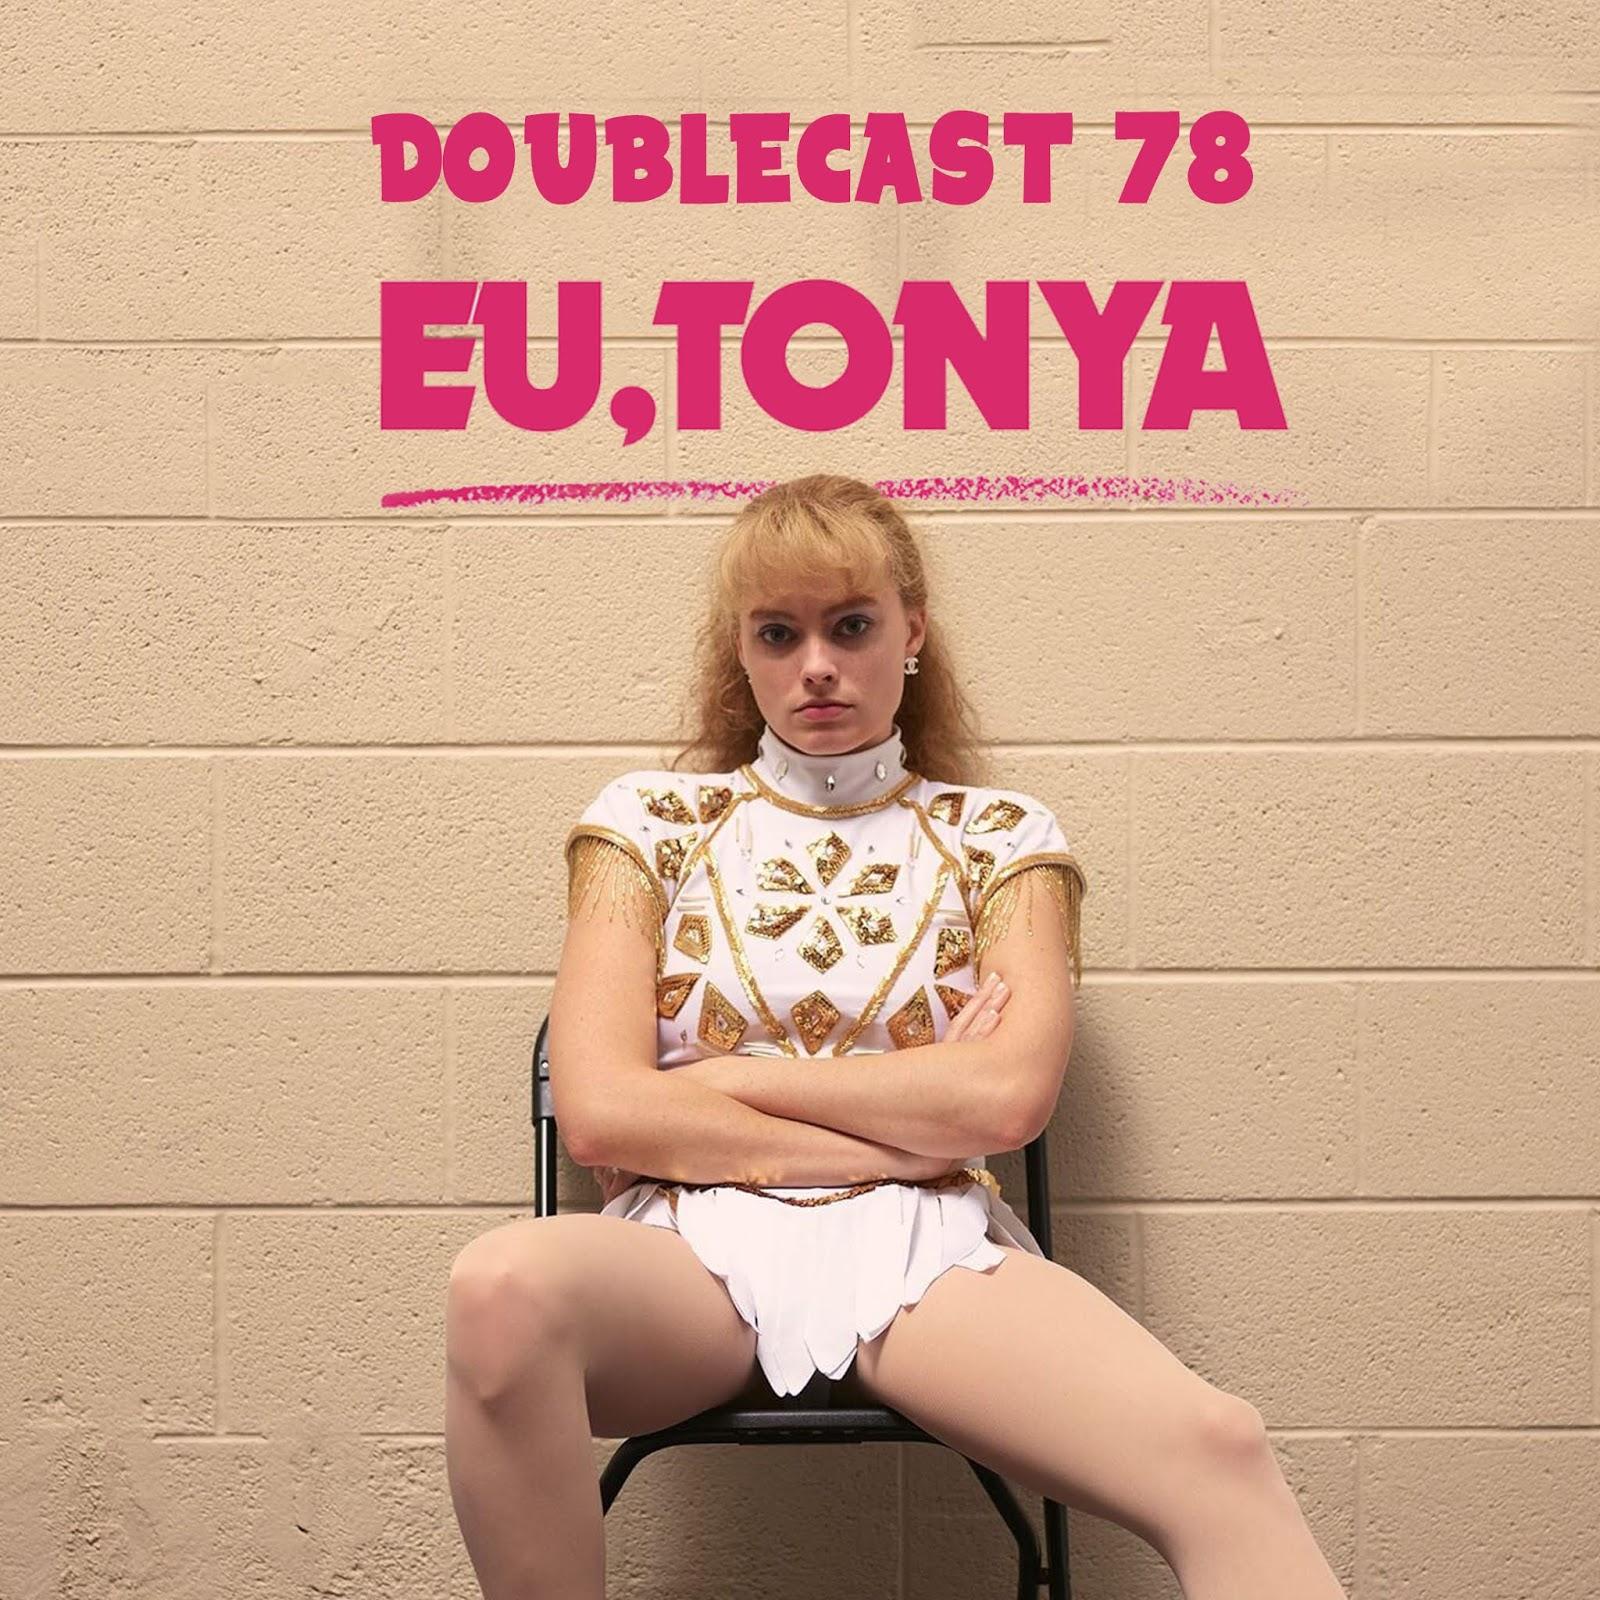 Doublecast 78 - Eu, Tonya